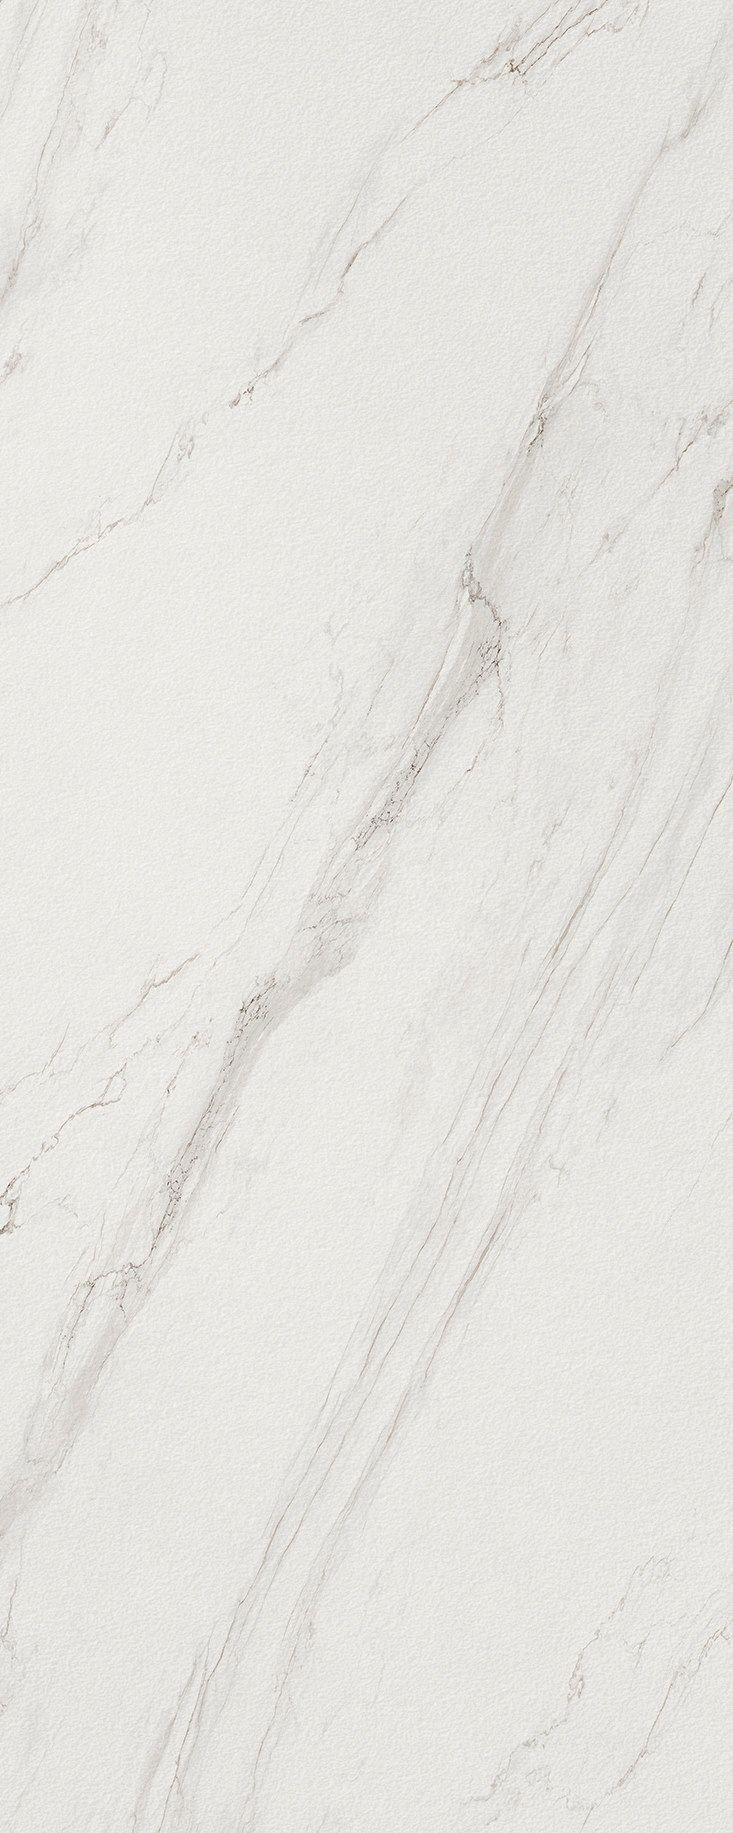 Touché Super Blanco-Gris Abujardado / Bush-hammered 100x250 cm